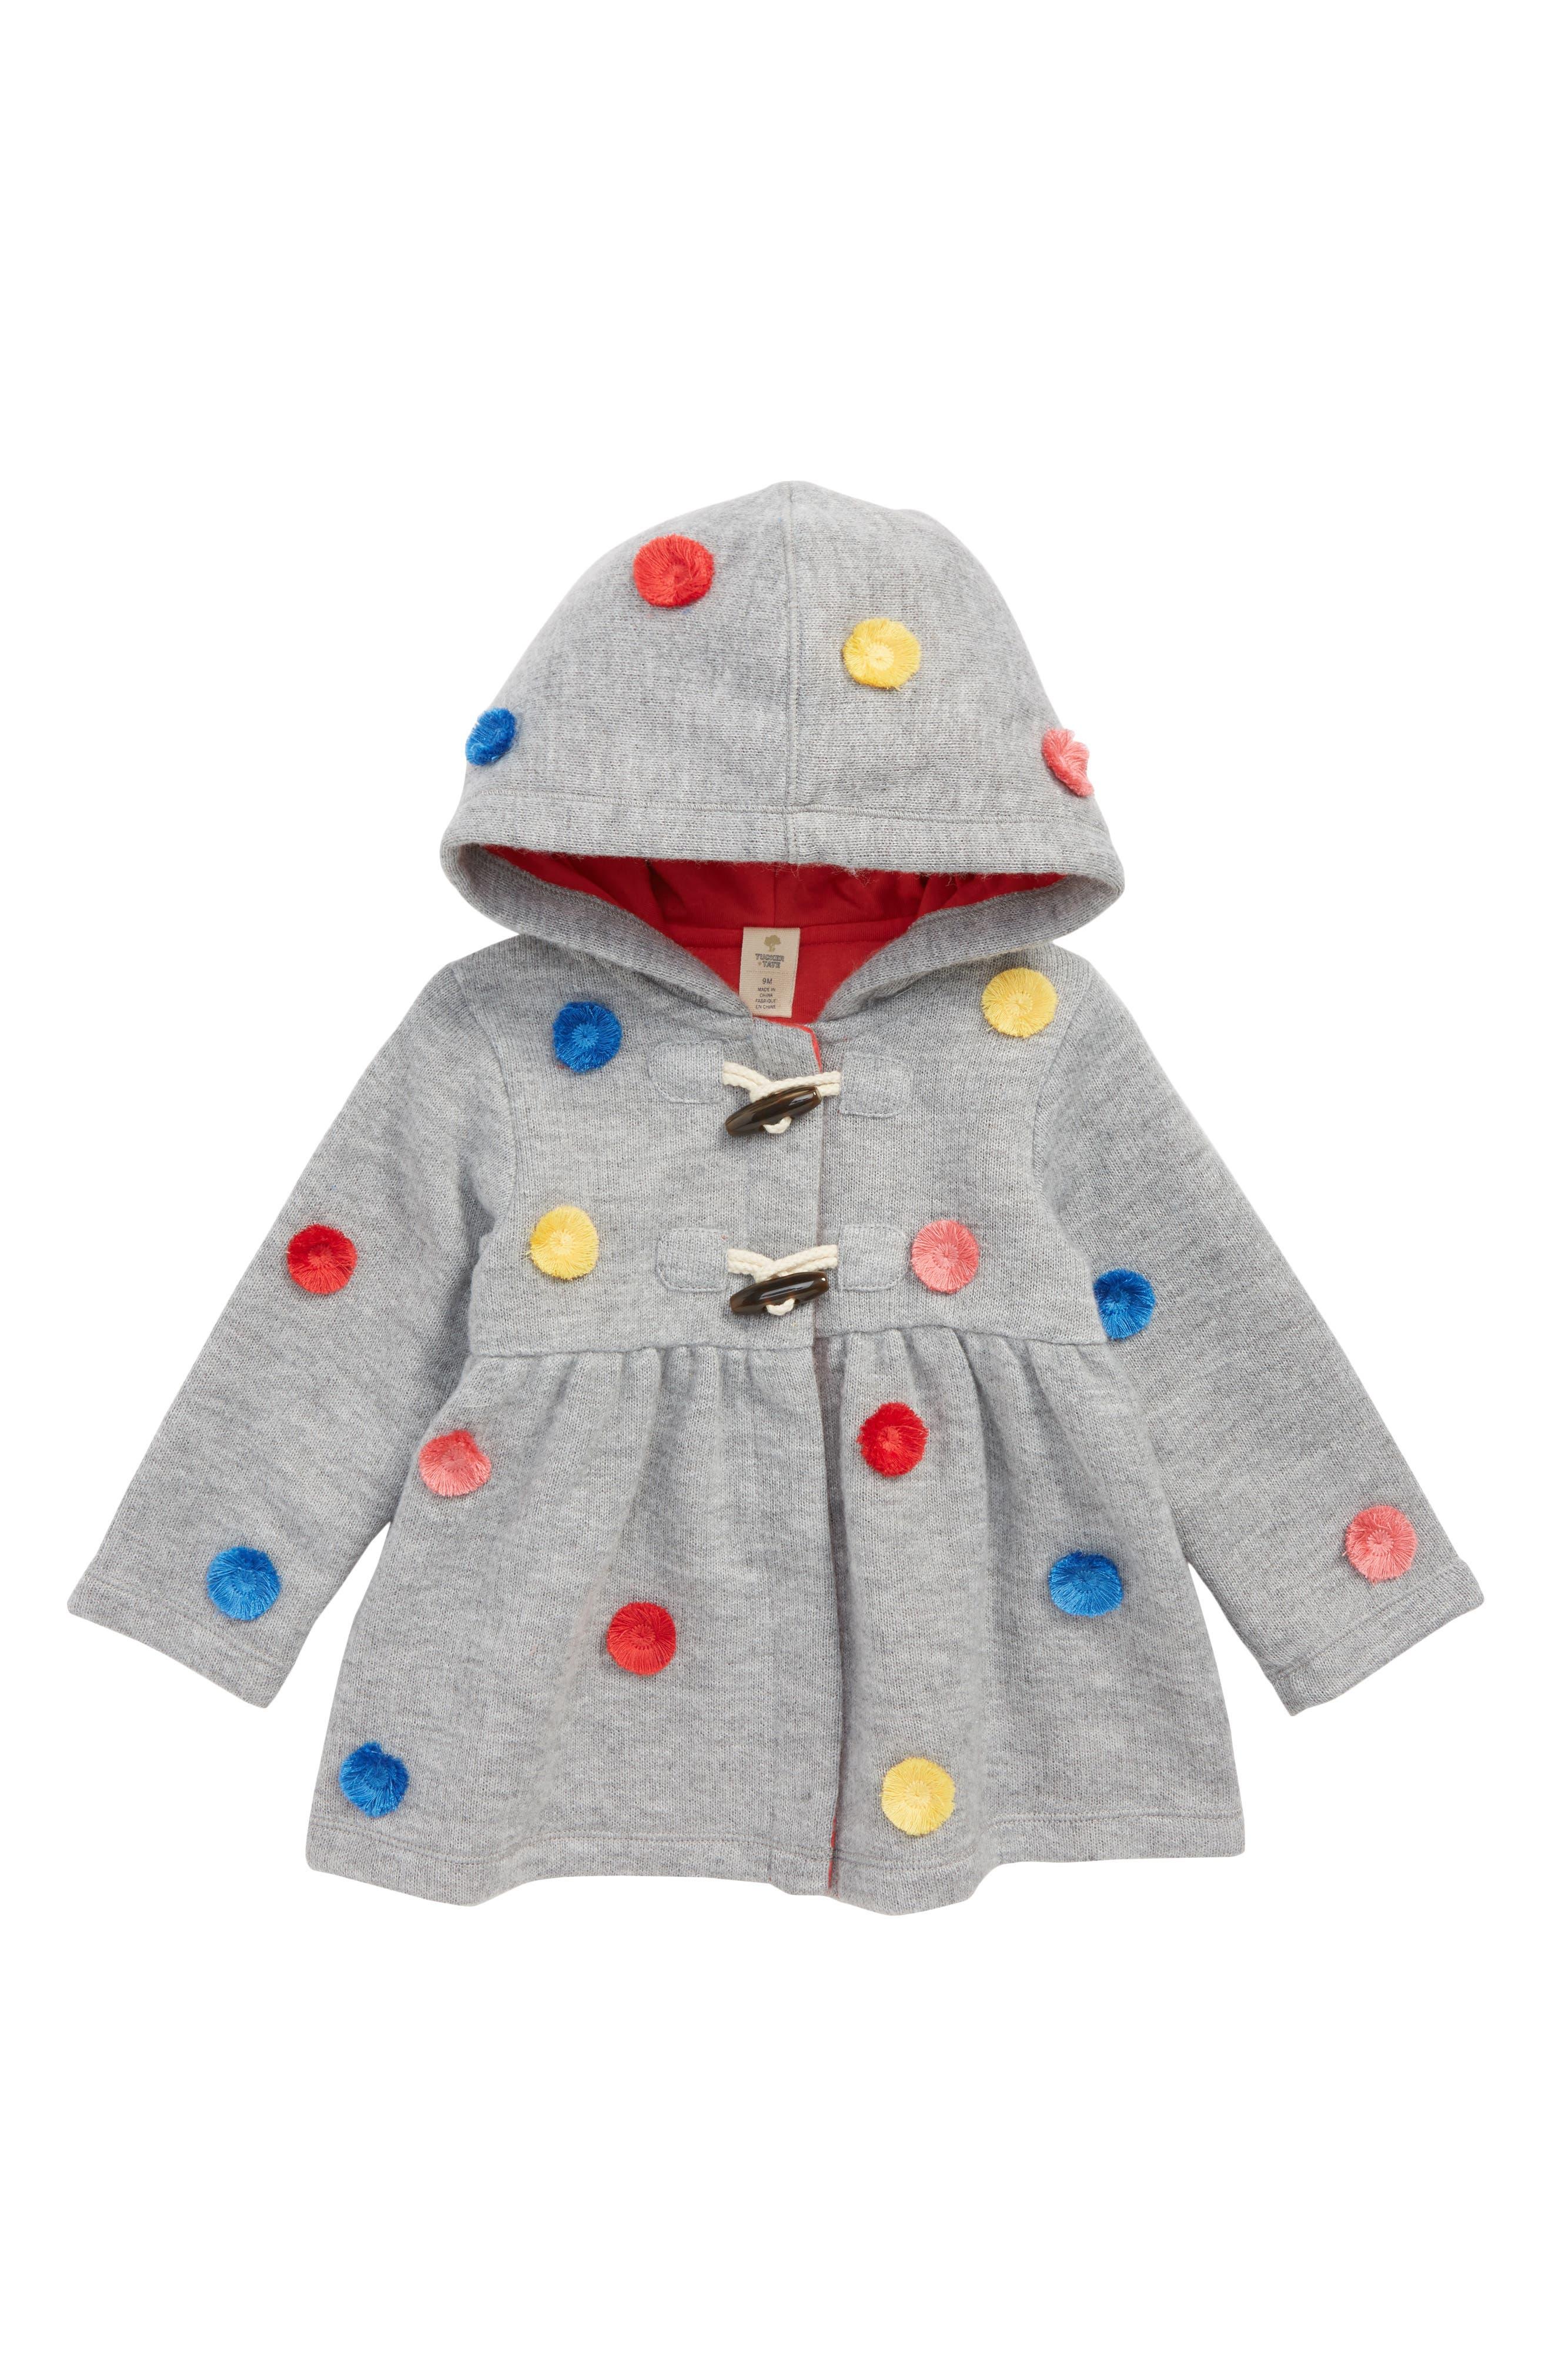 Pompom Hooded Knit Jacket,                         Main,                         color, GREY ASH HEATHER